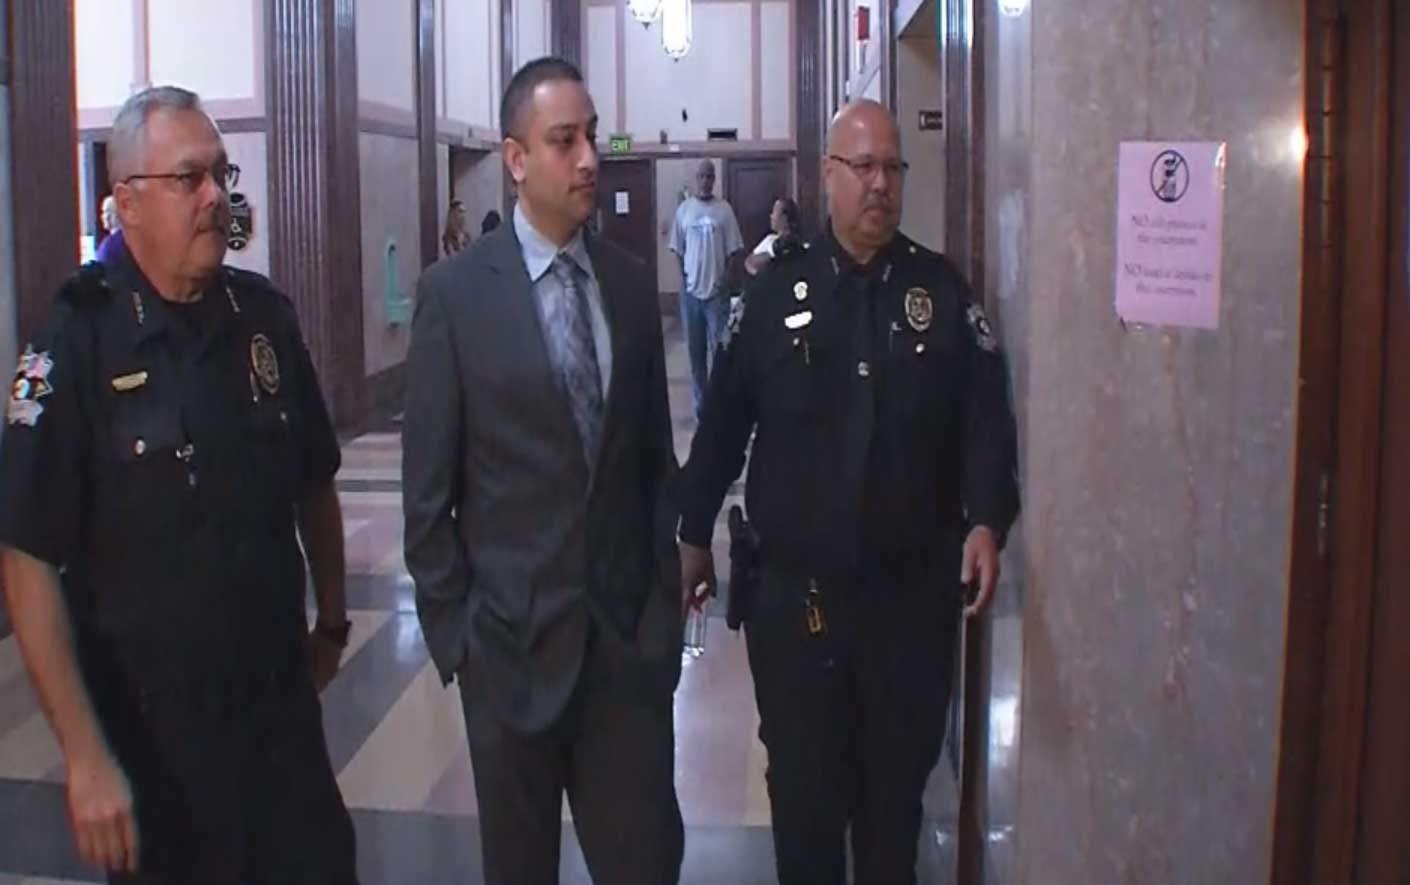 Jury Finds Bert Franklin Guilty Of Killing Toddler, Murder-For-Hire Plot